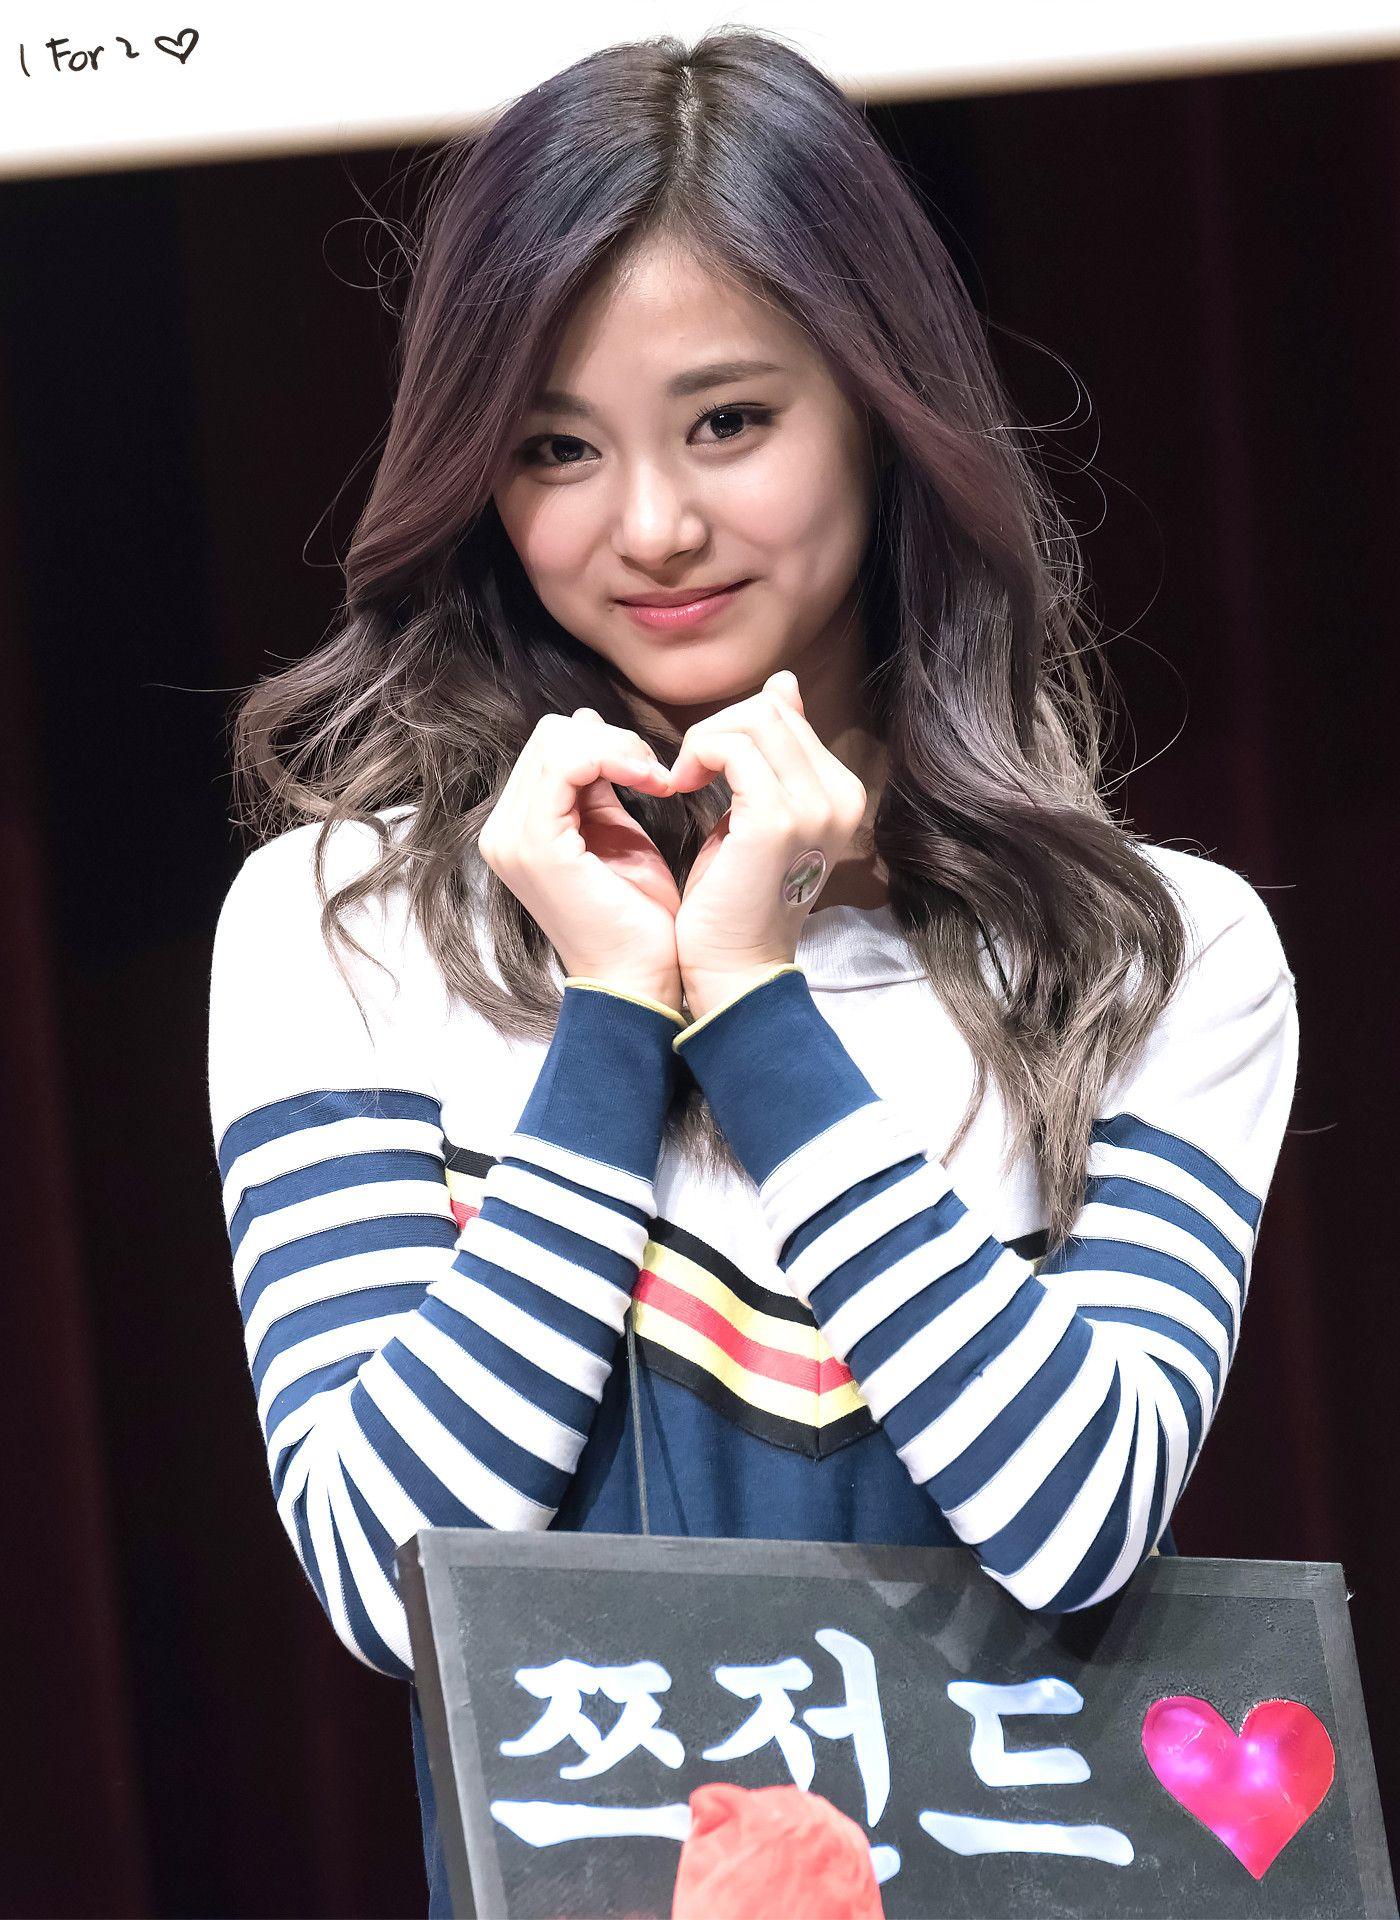 Tzuyu Kpics Kpop Sweetgirls Lovethem Love Unsensored Girls Sweet Sexygirls Selfie Women Kpop Girls Asian Beauty Girl Korean Girl Groups